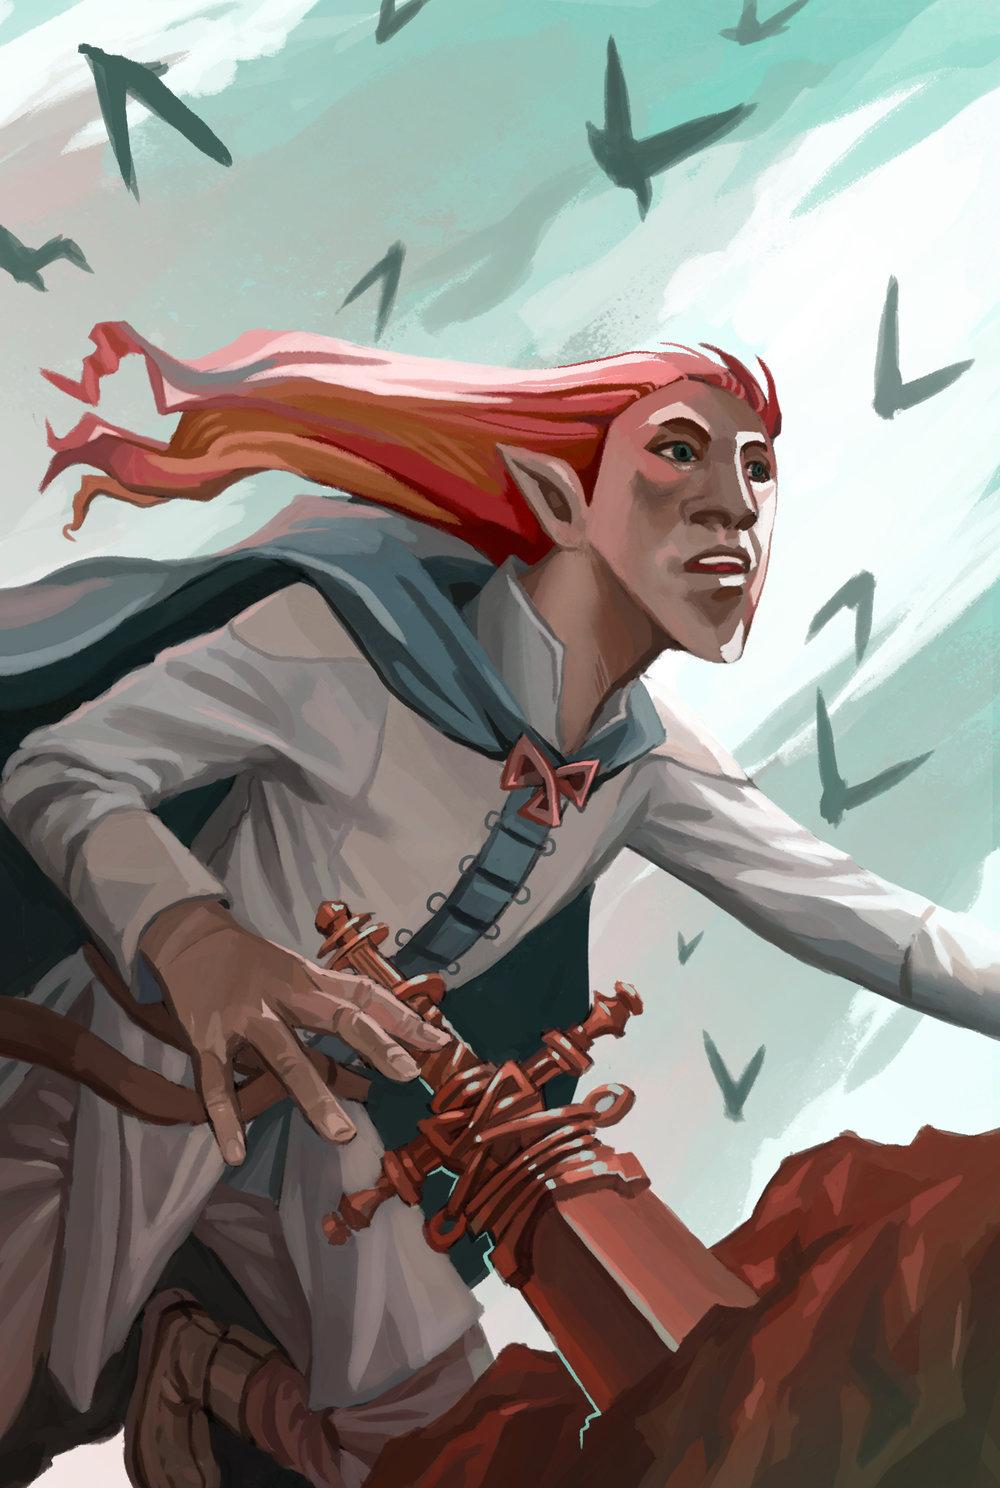 devon_george_sword_illustration.jpg